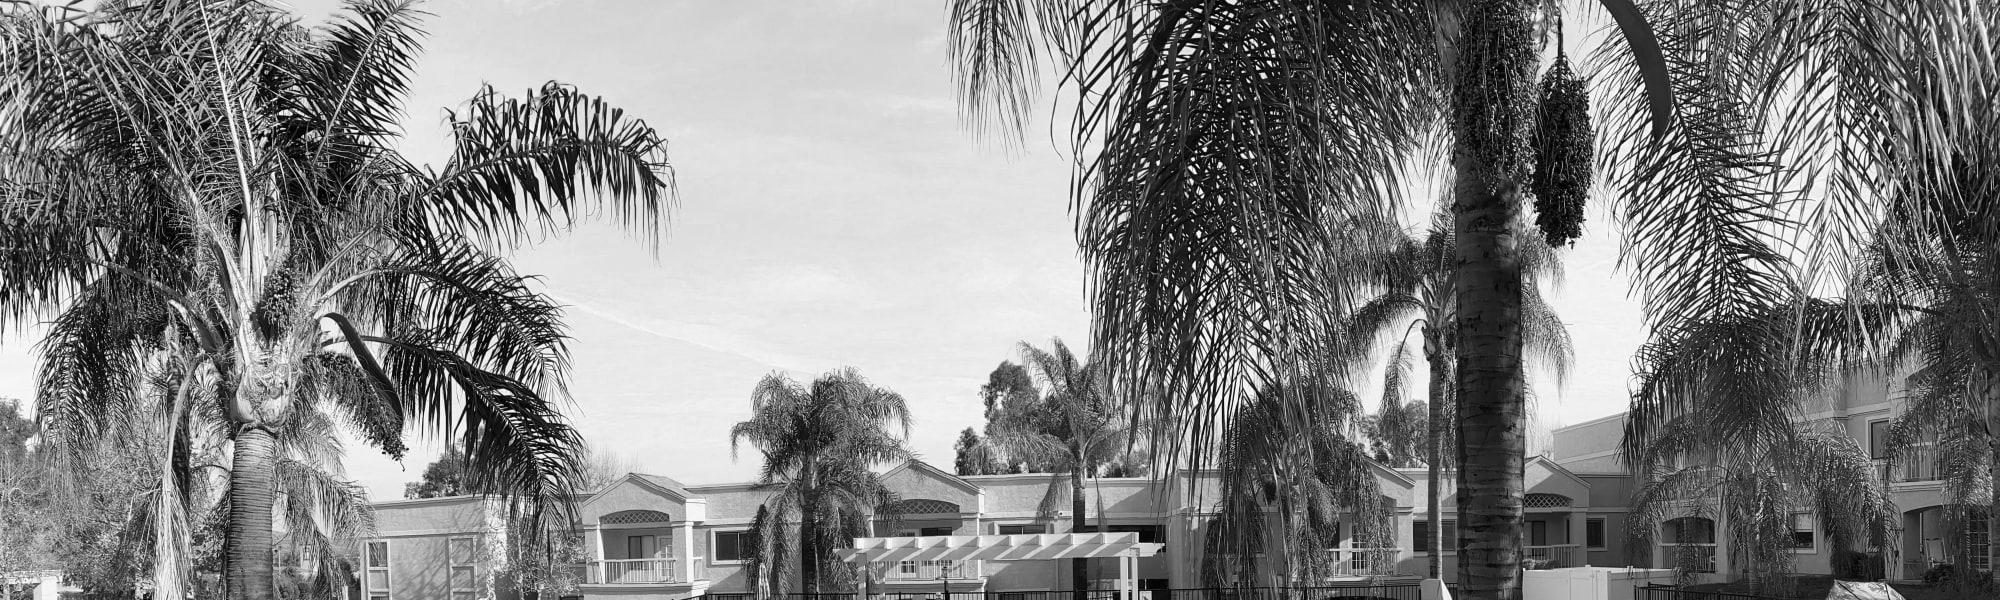 Schedule a tour at Pacifica Senior Living Menifee in Sun City, California.